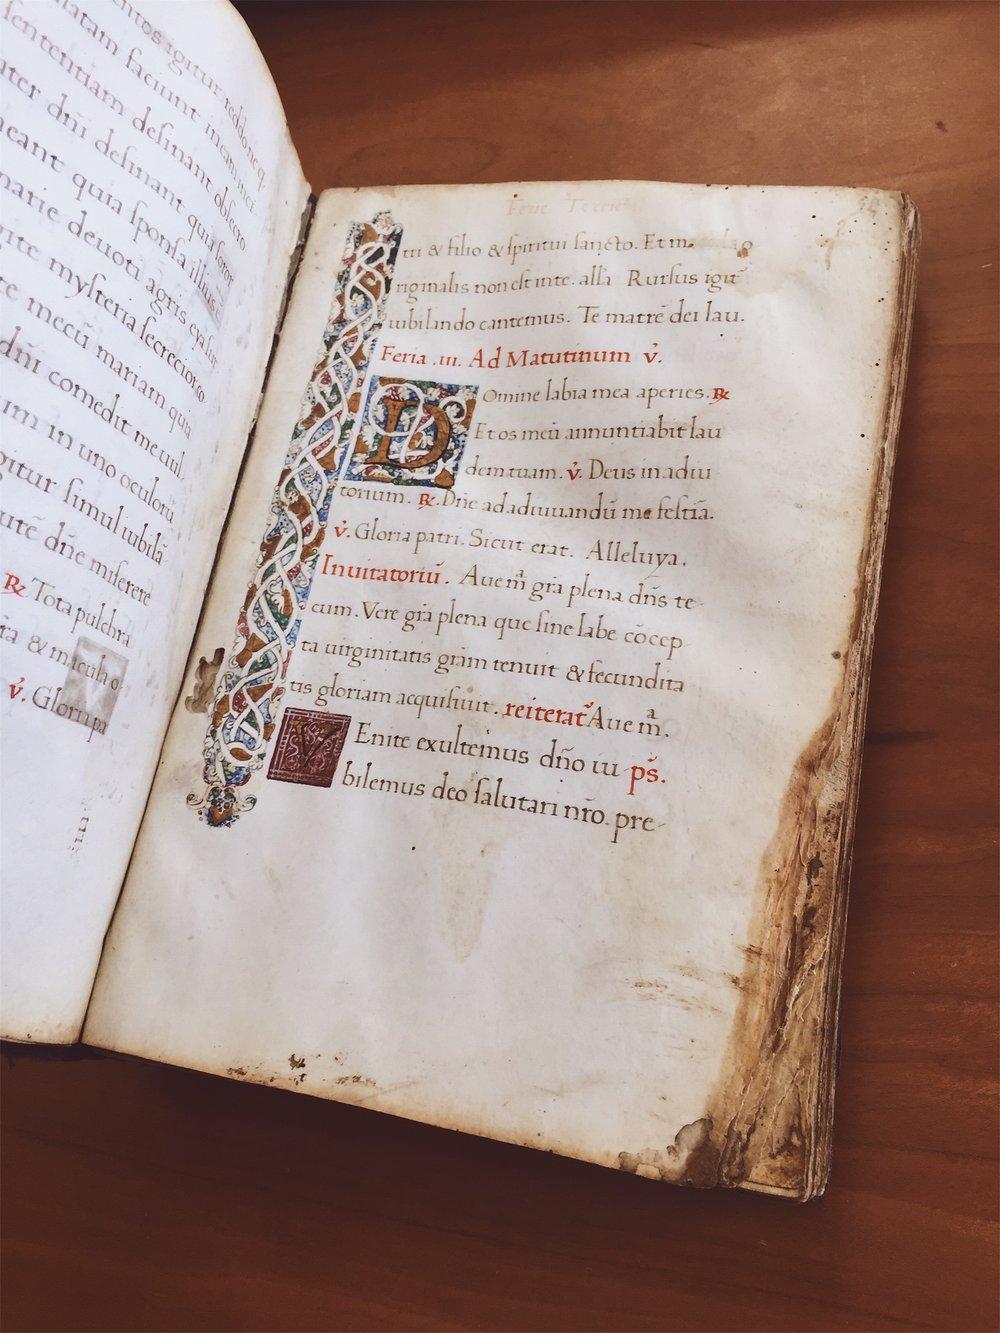 Manuscript illuminators added colors by hand